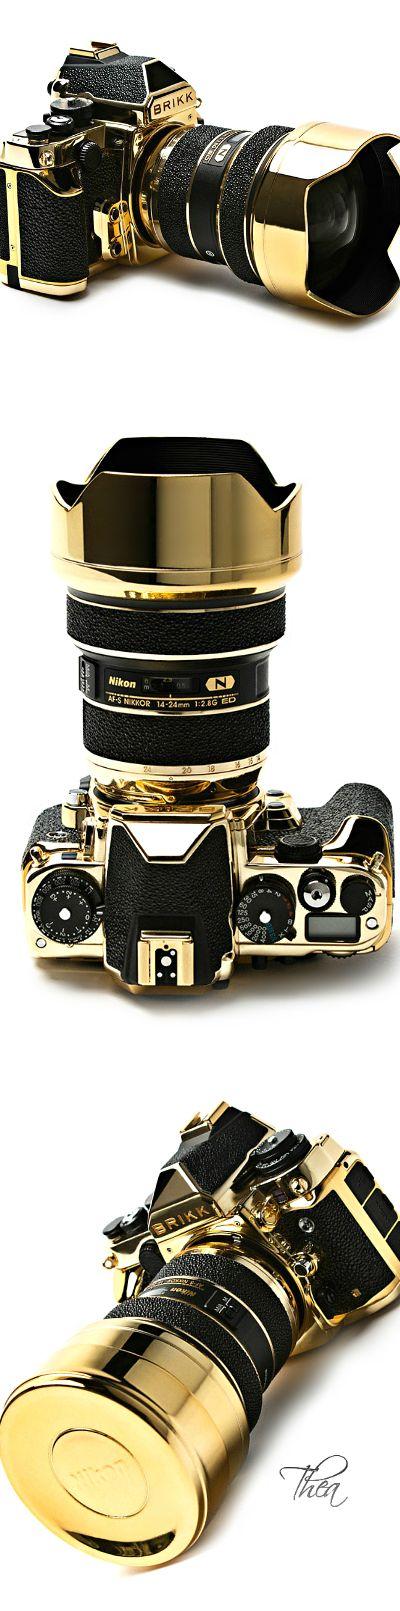 ~ Luxury Lifestyle Archives ~ | Brikk-24K Gold Stingray Lux Nikon DF Camera | luxurydecor.org